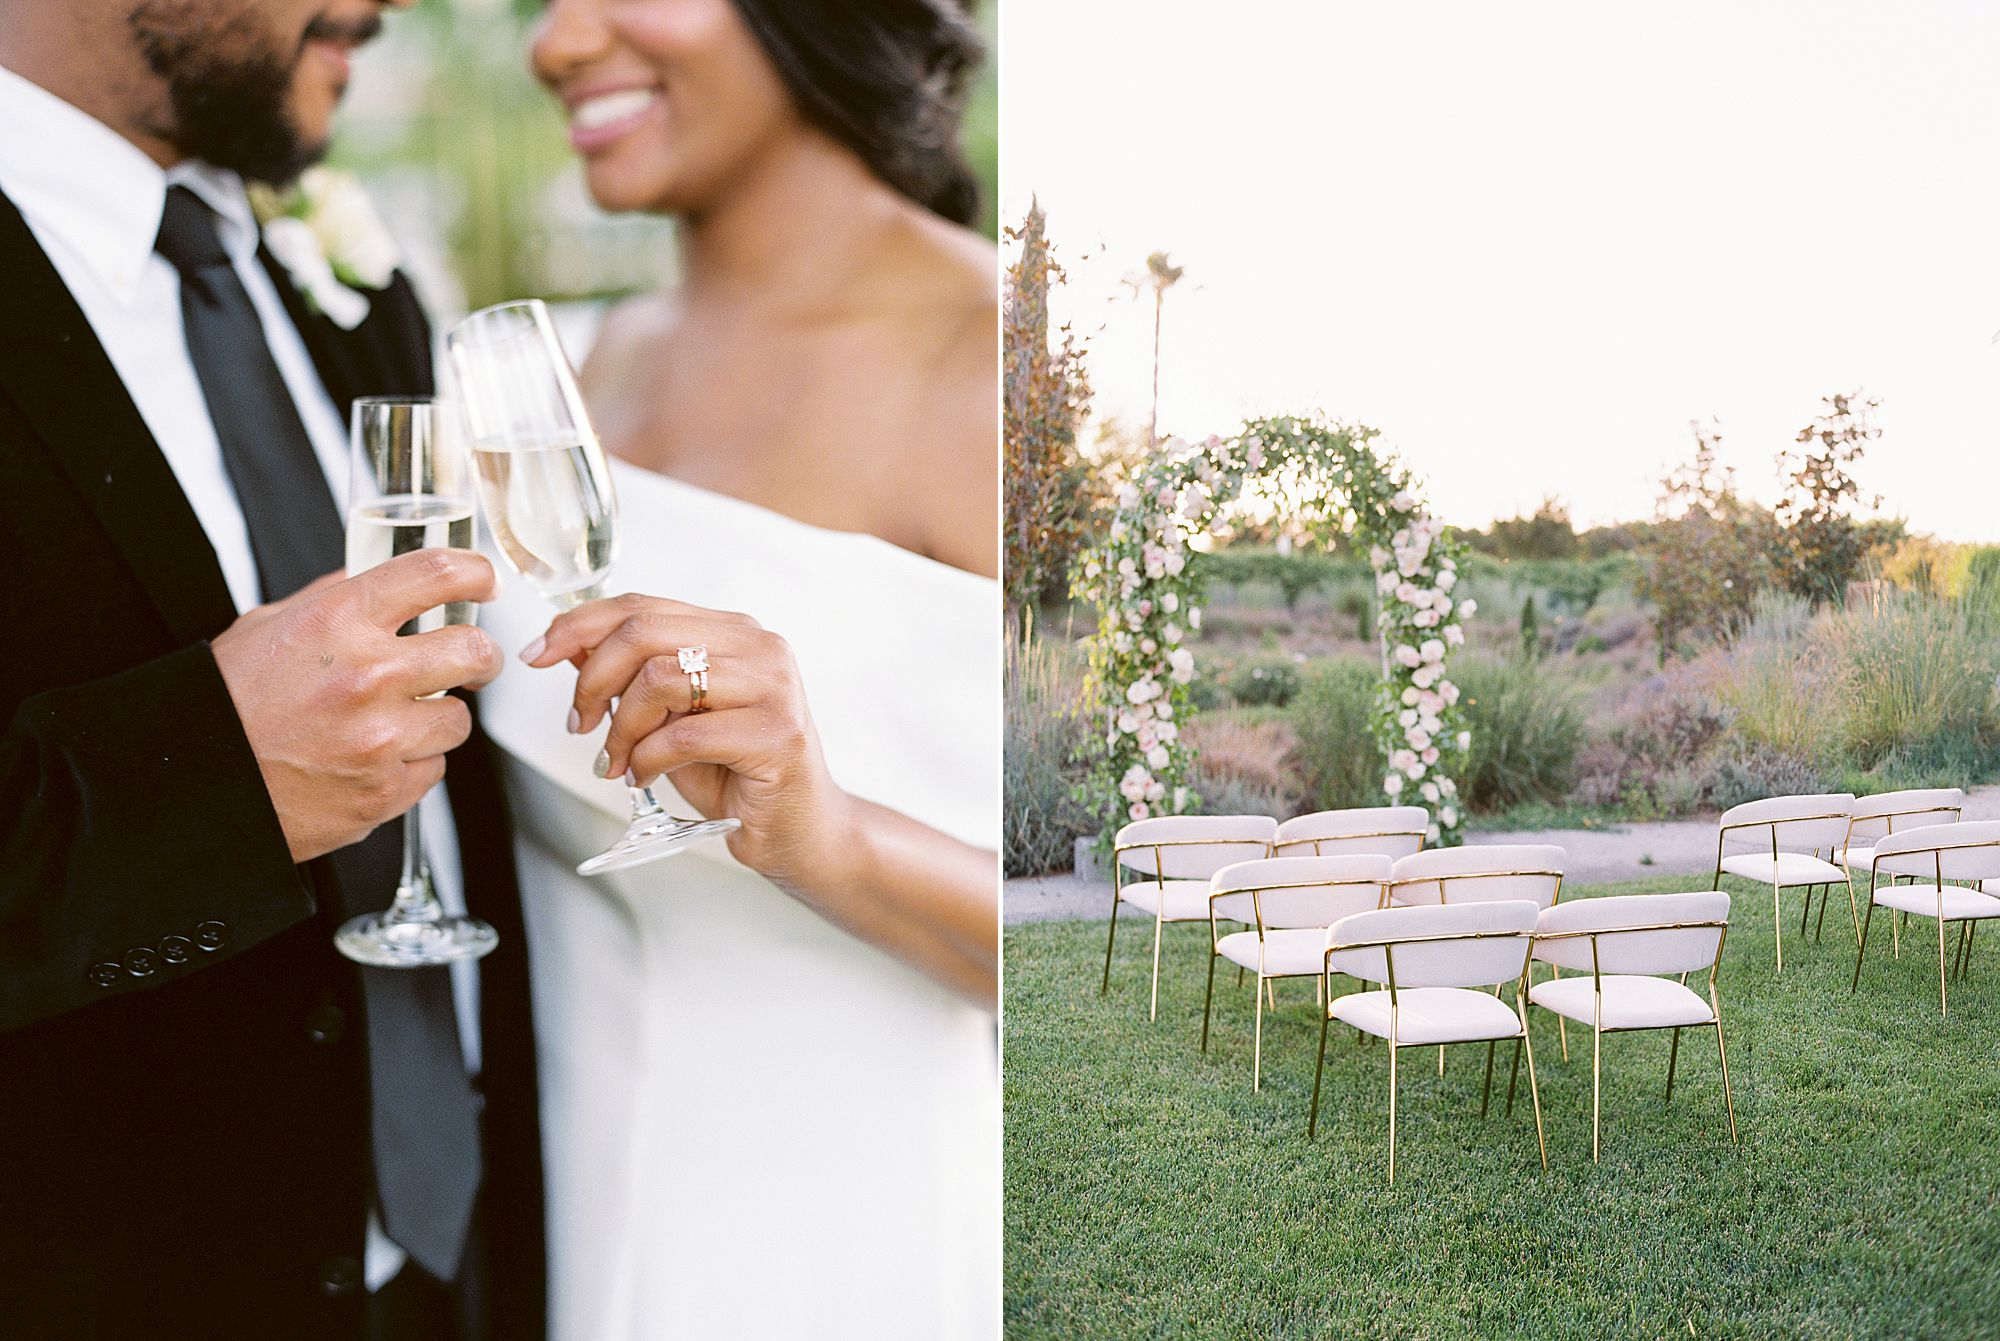 Park Winters Micro-Wedding Inspiration on Style Me Pretty - Stephanie Teague Events - Ashley Baumgartner - Park Winters Wedding - Black Tie Wedding - Micro-Wedding Sacramento Photographer_0031.jpg